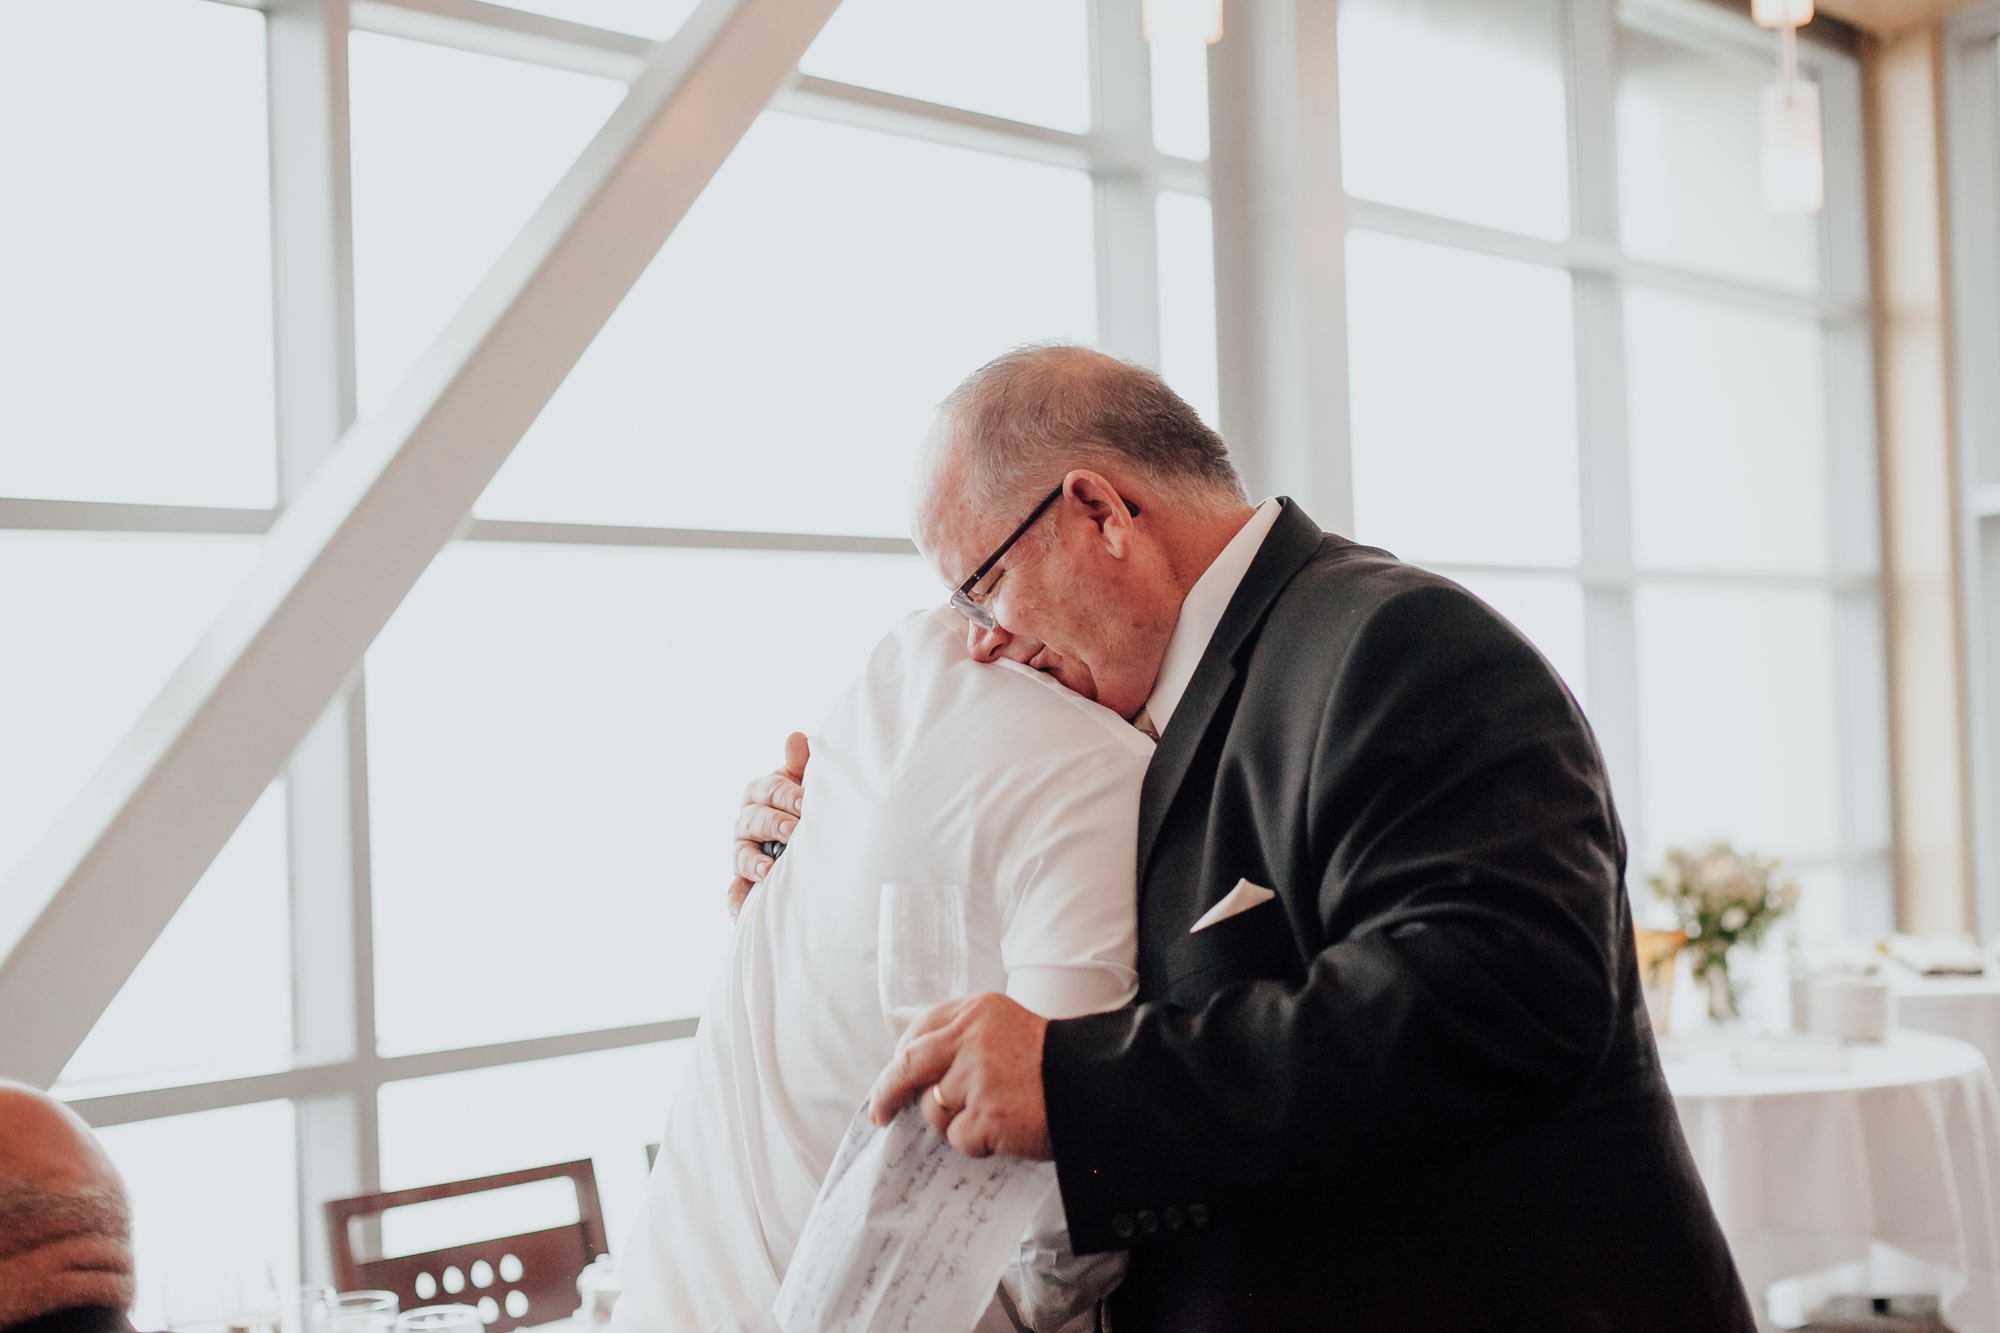 san-francisco-city-hall-wedding-marble-rye-photography-011770.JPG